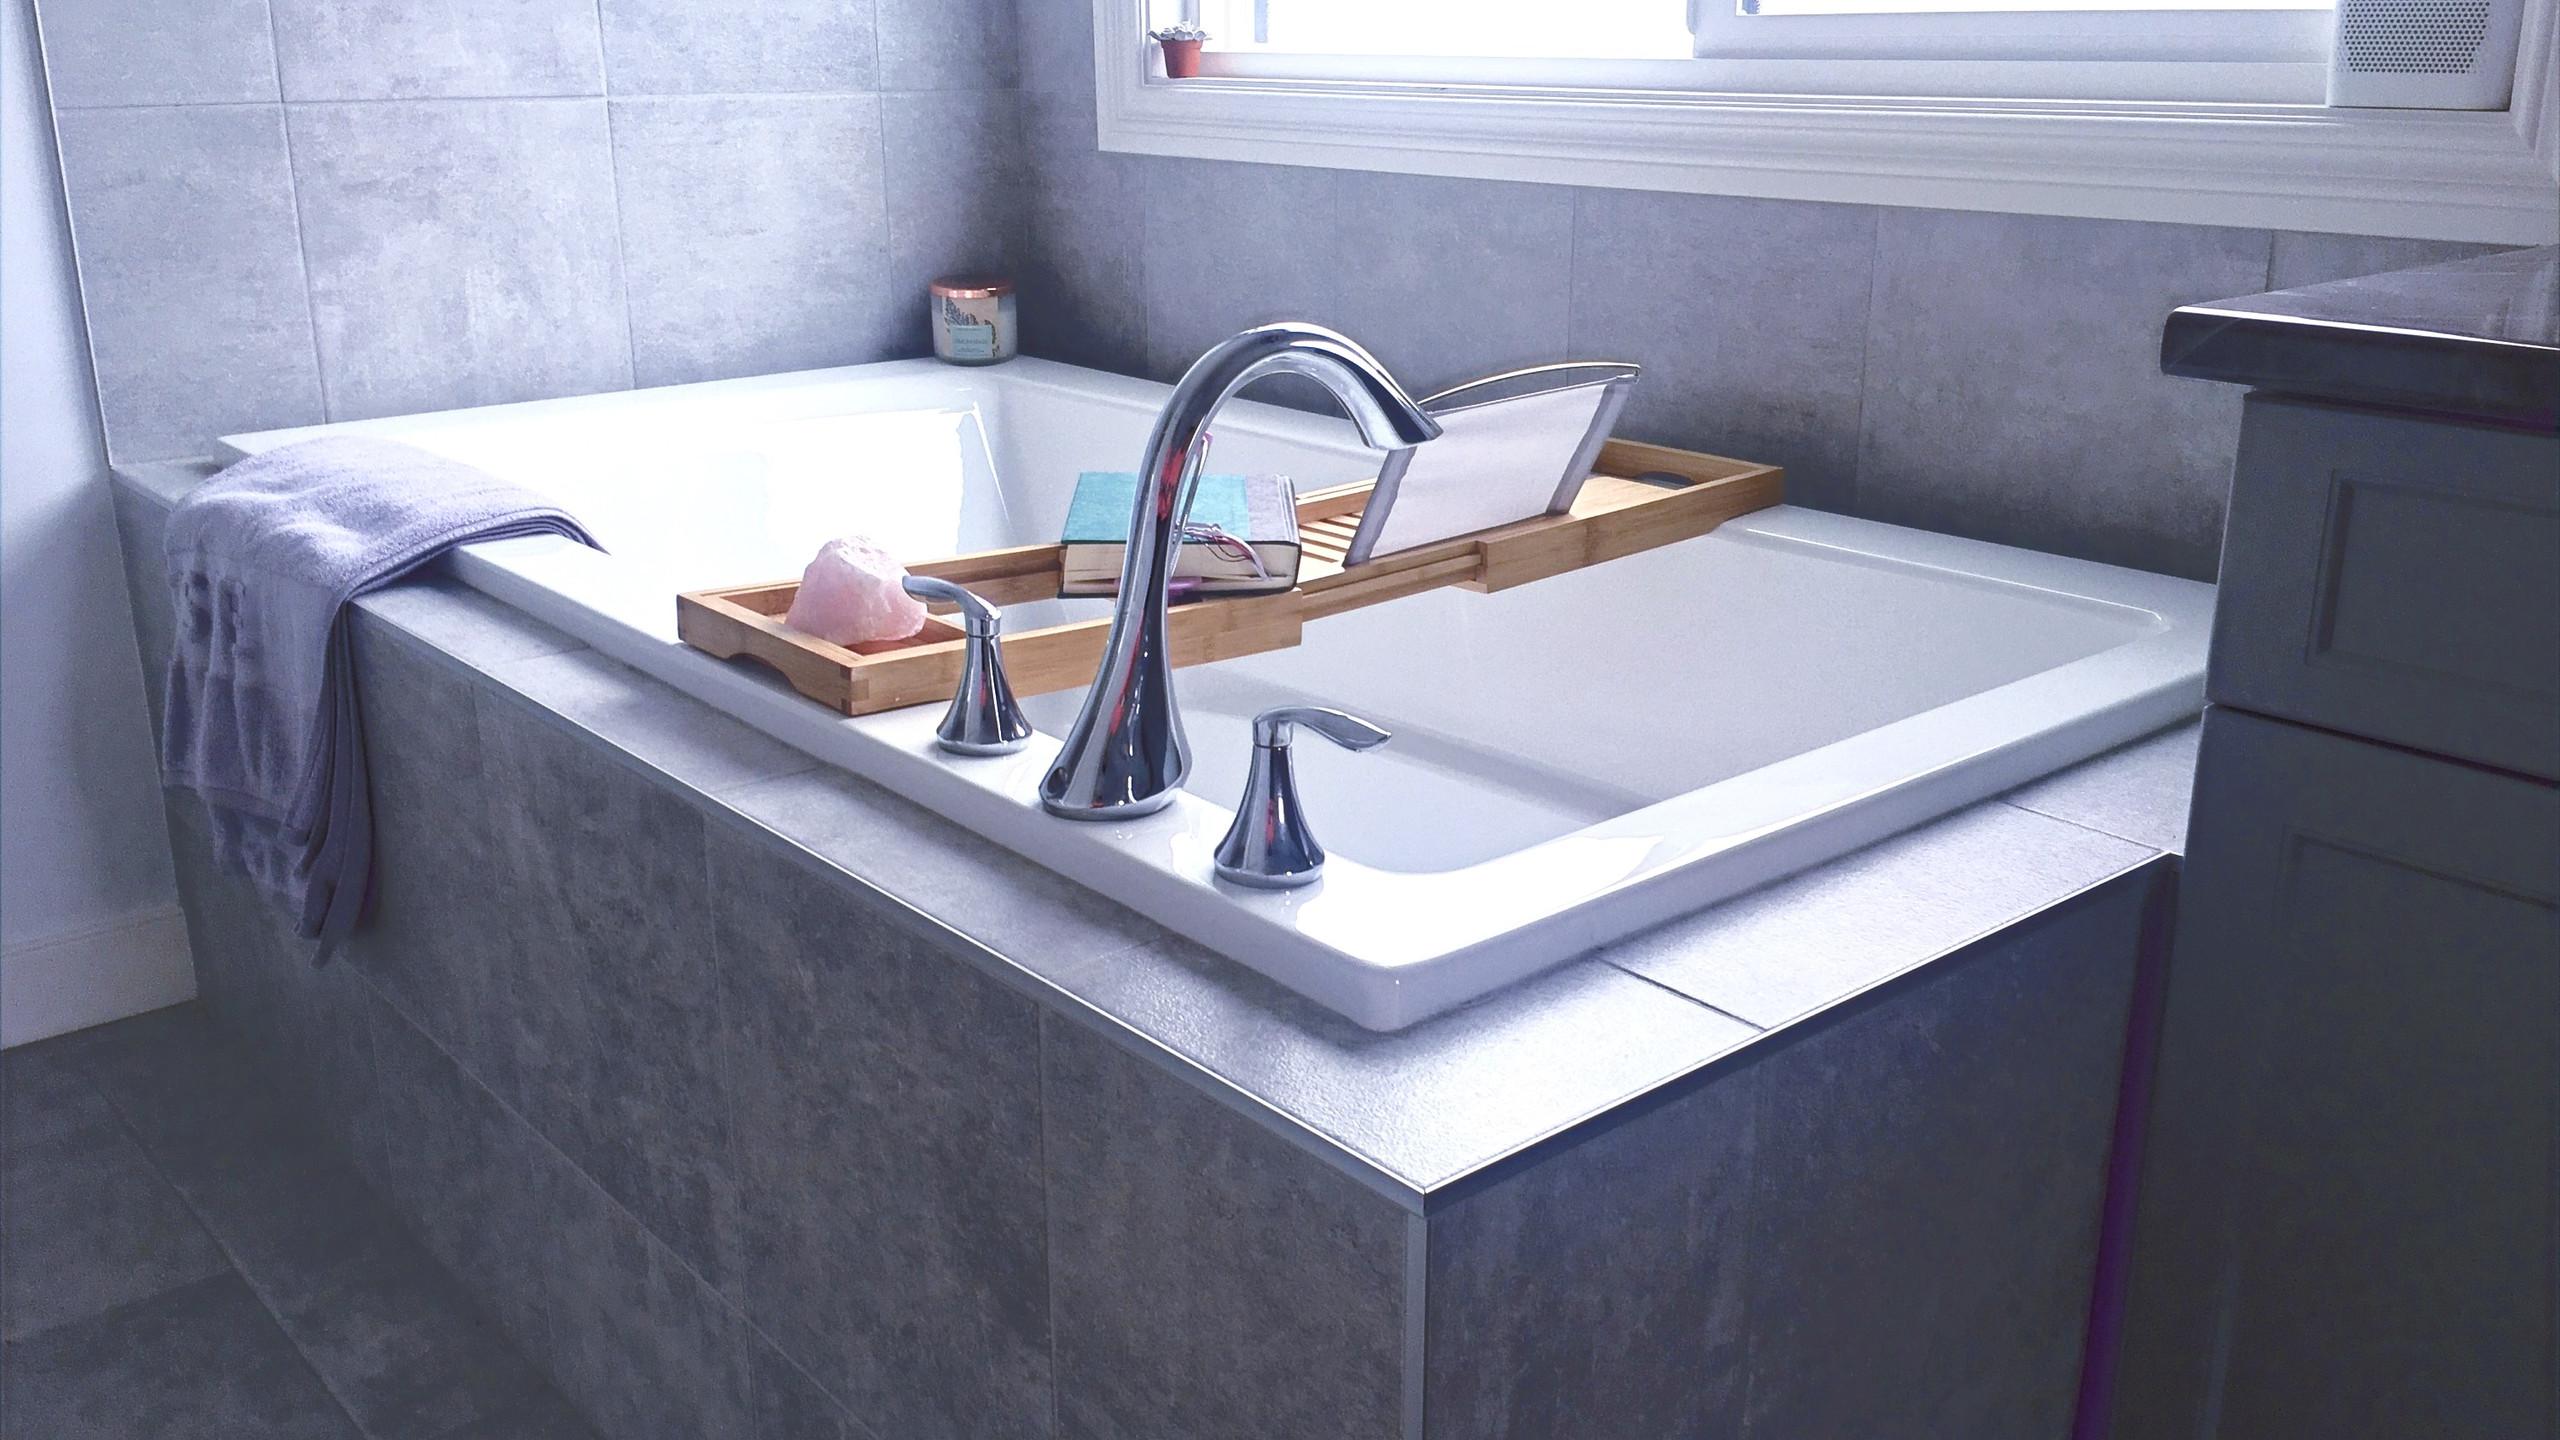 The Bath_edited